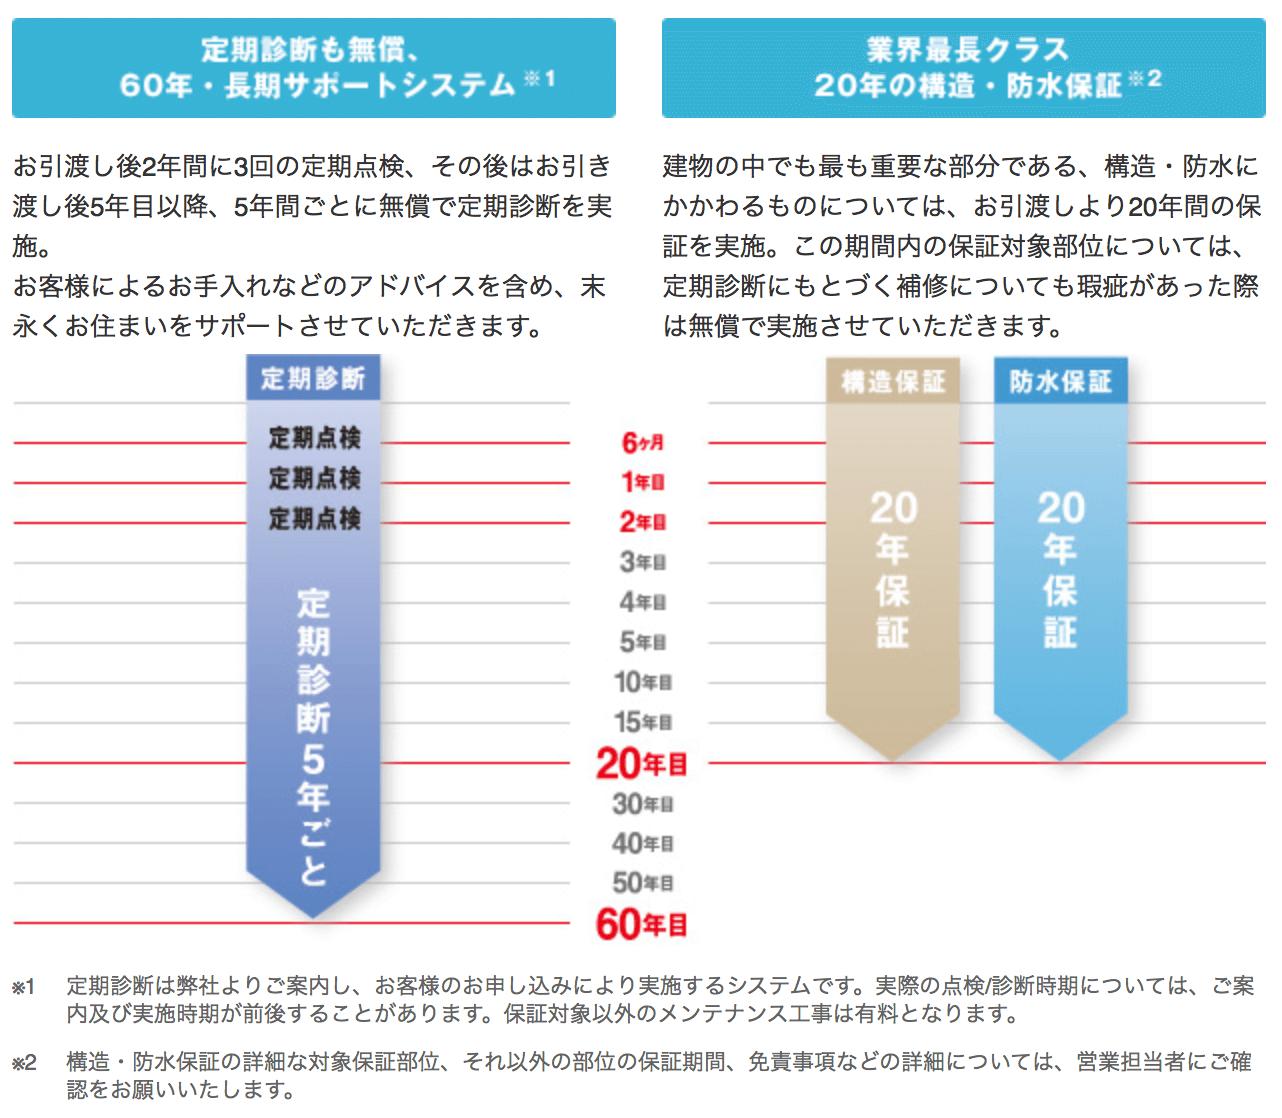 %e3%82%b9%e3%82%af%e3%83%aa%e3%83%bc%e3%83%b3%e3%82%b7%e3%83%a7%e3%83%83%e3%83%88-2017-01-07-15-18-10